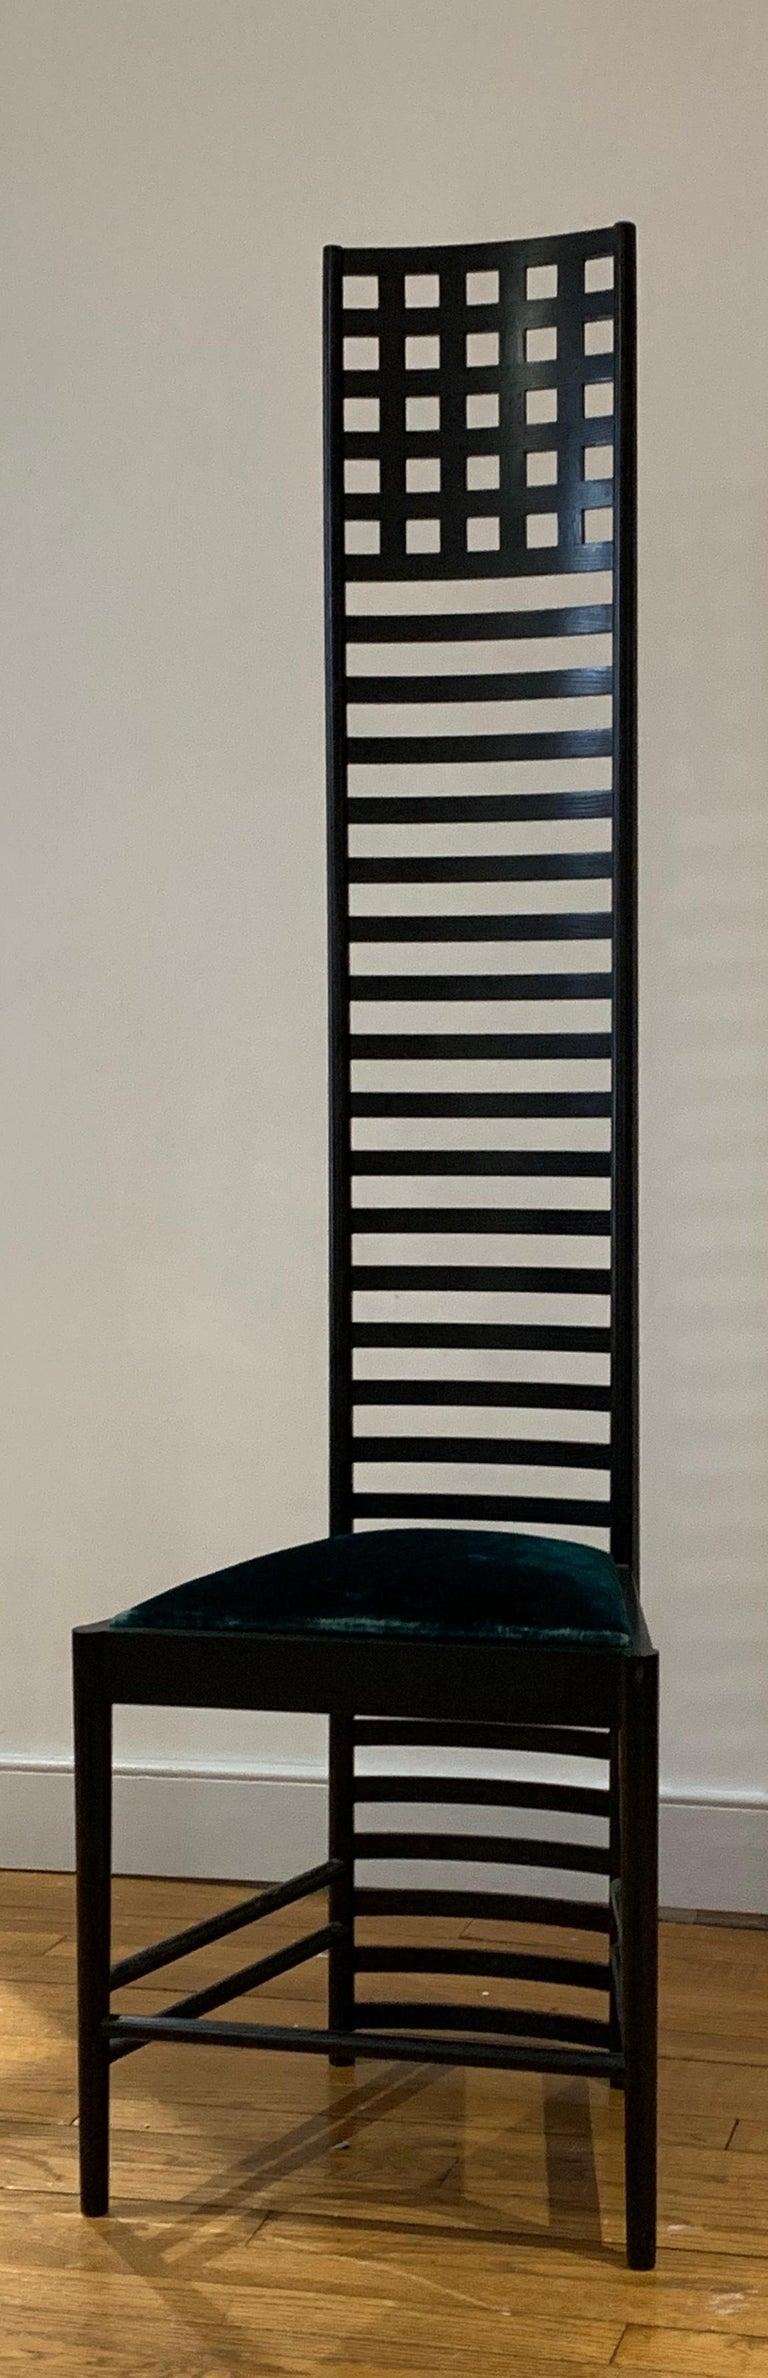 Italian Chales Rennie Mackintosh Cassina Silk Velvet 292 Hill House 1 Chair Italy 1960s